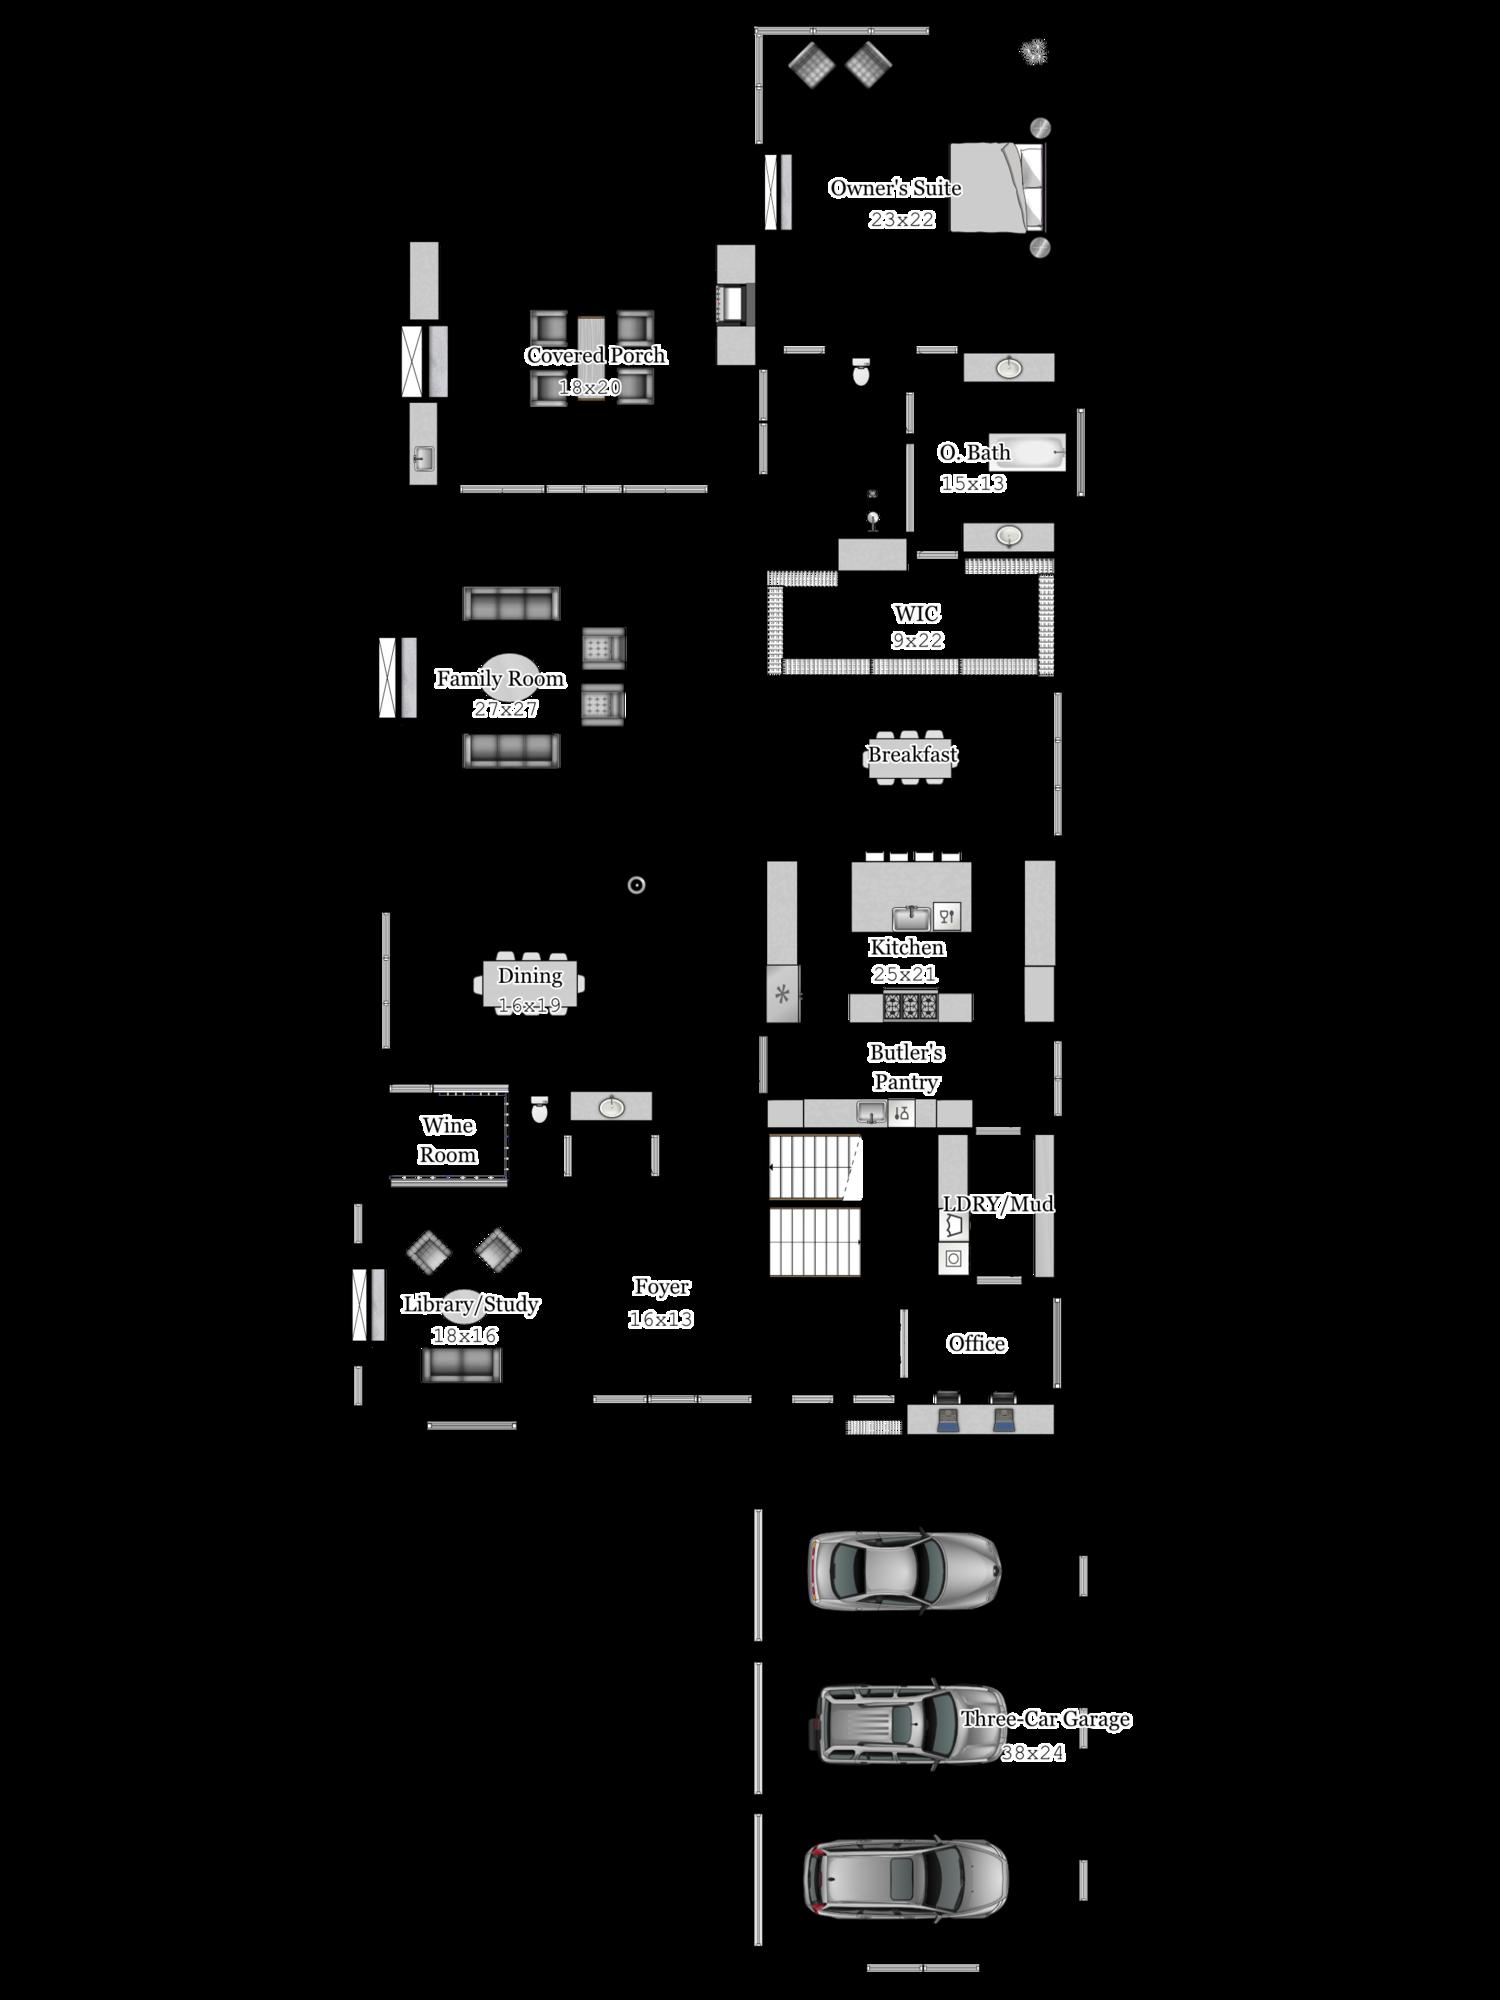 Yukon 256 Sf Floor Plan Cherokee Cabin Company Town And Country Plans Mini Doma Plan Doma Nebolshie Domiki